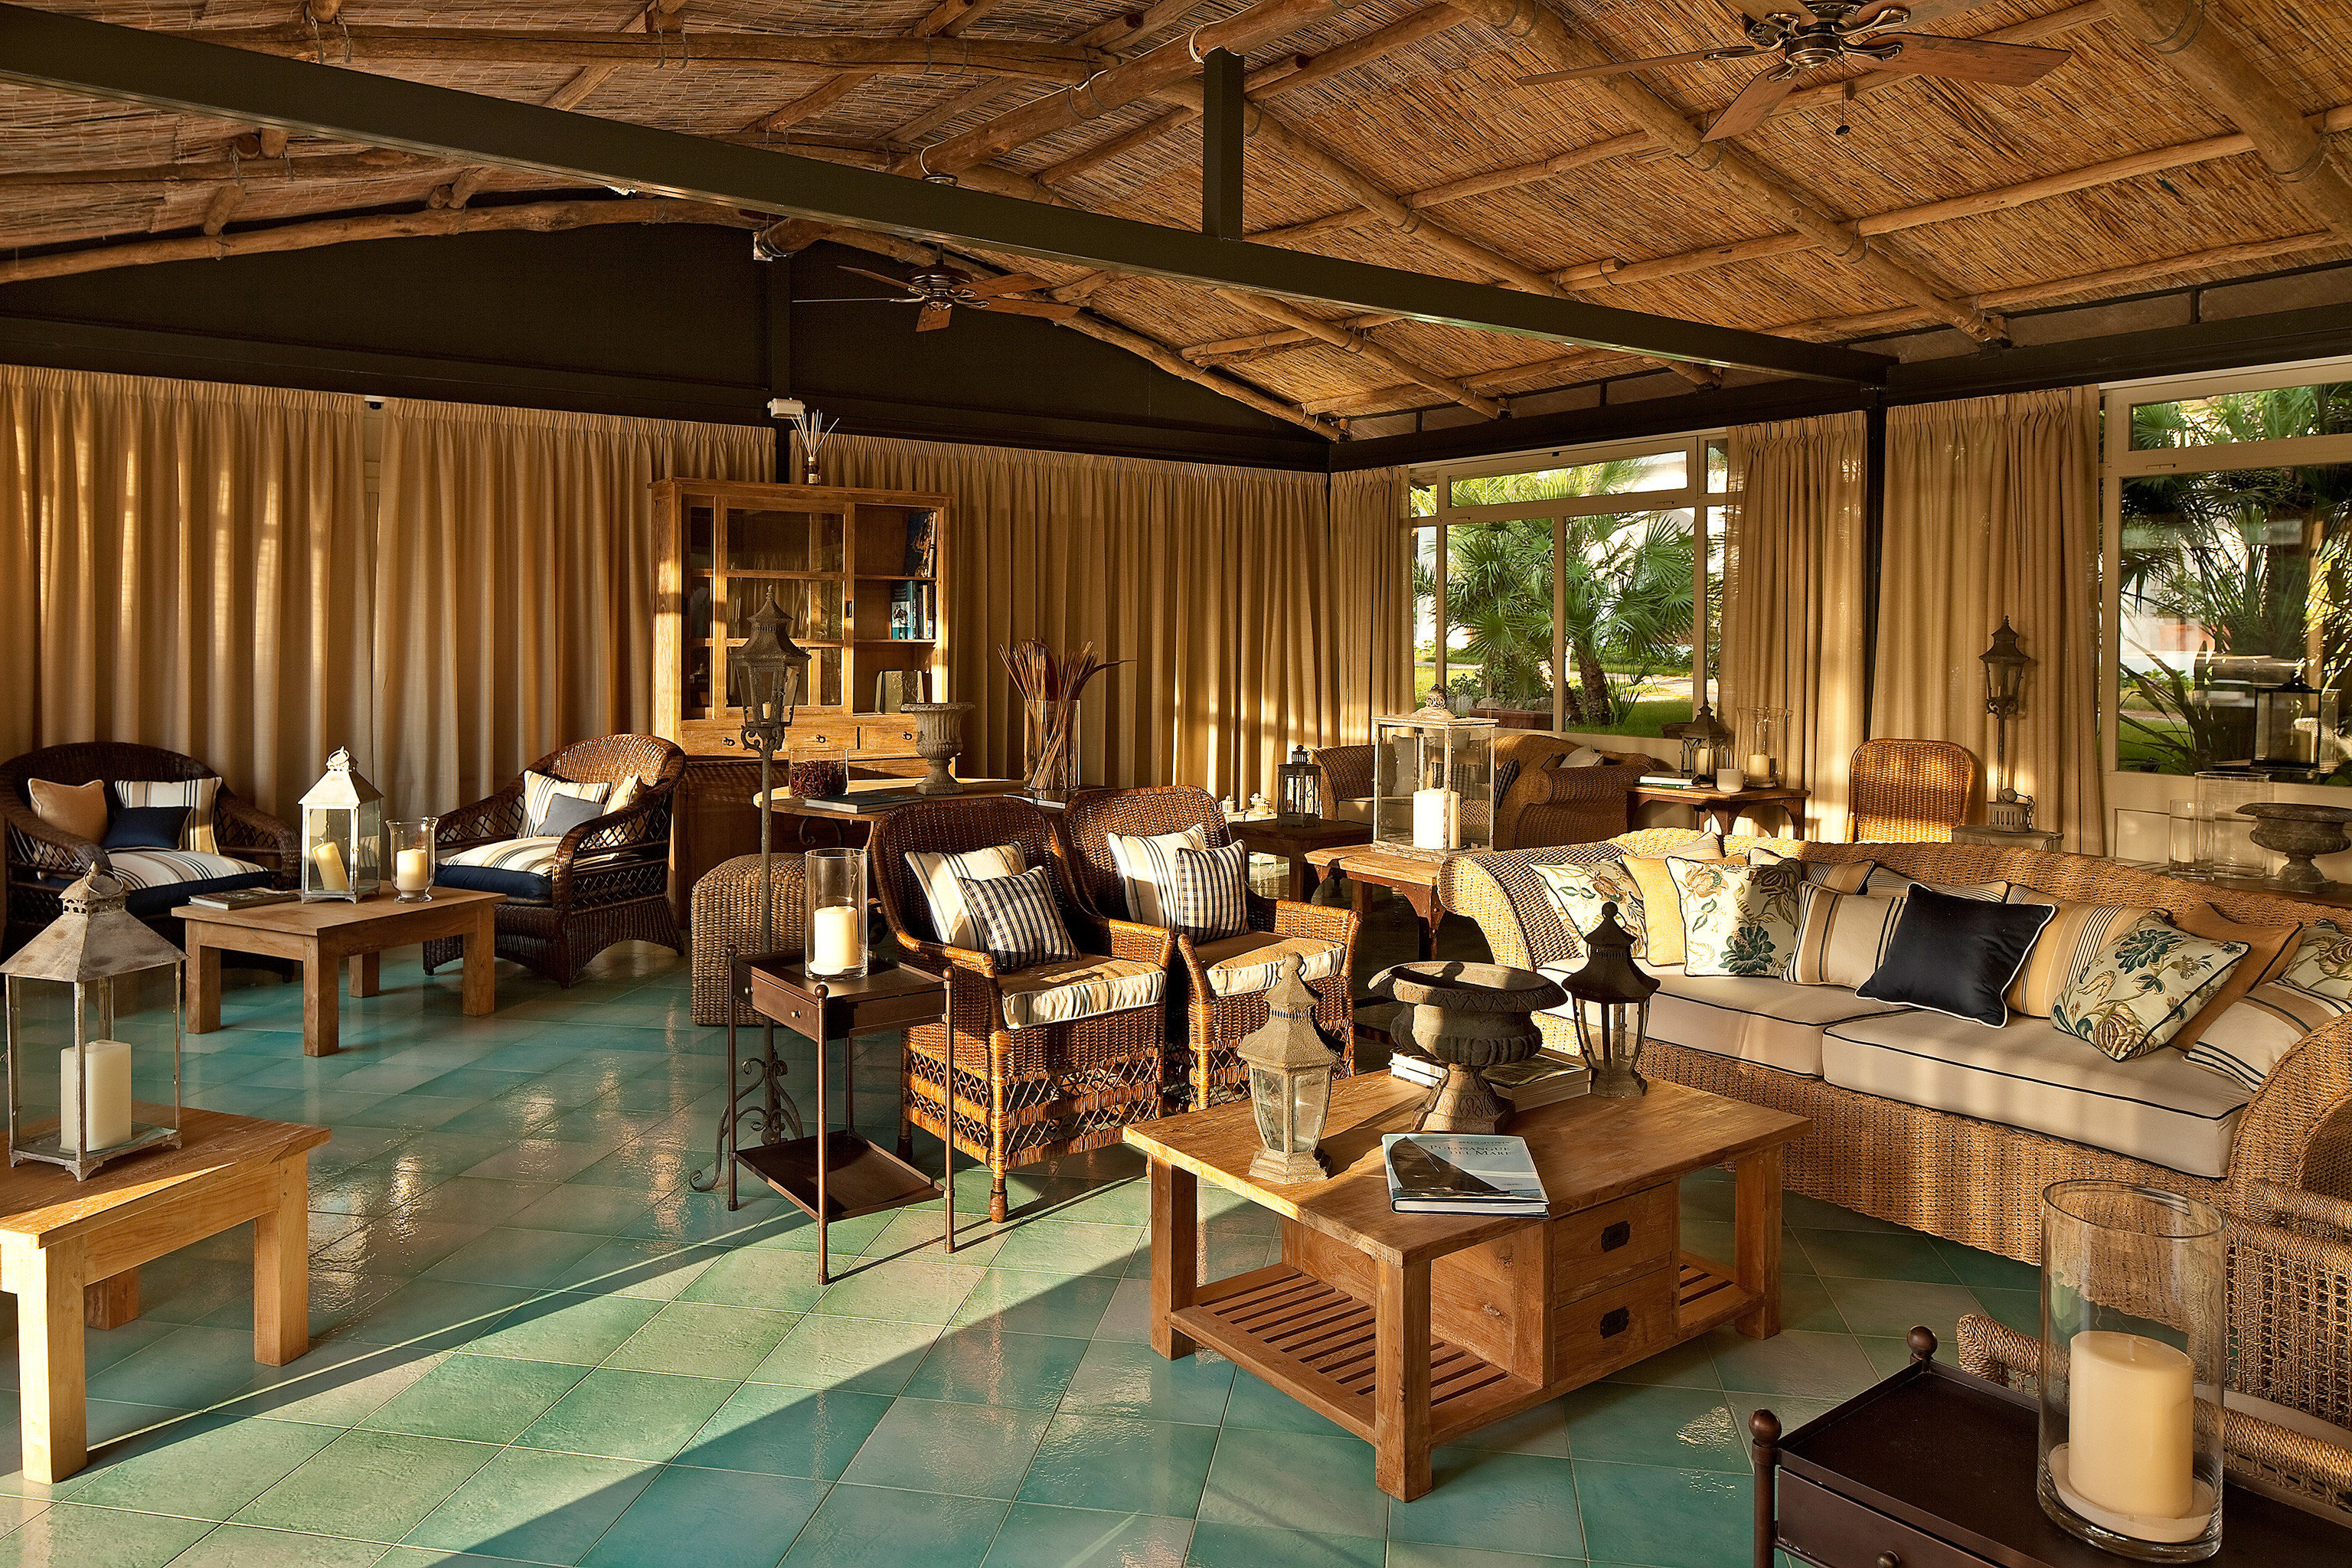 Lounge Patio Resort home restaurant recreation room Island